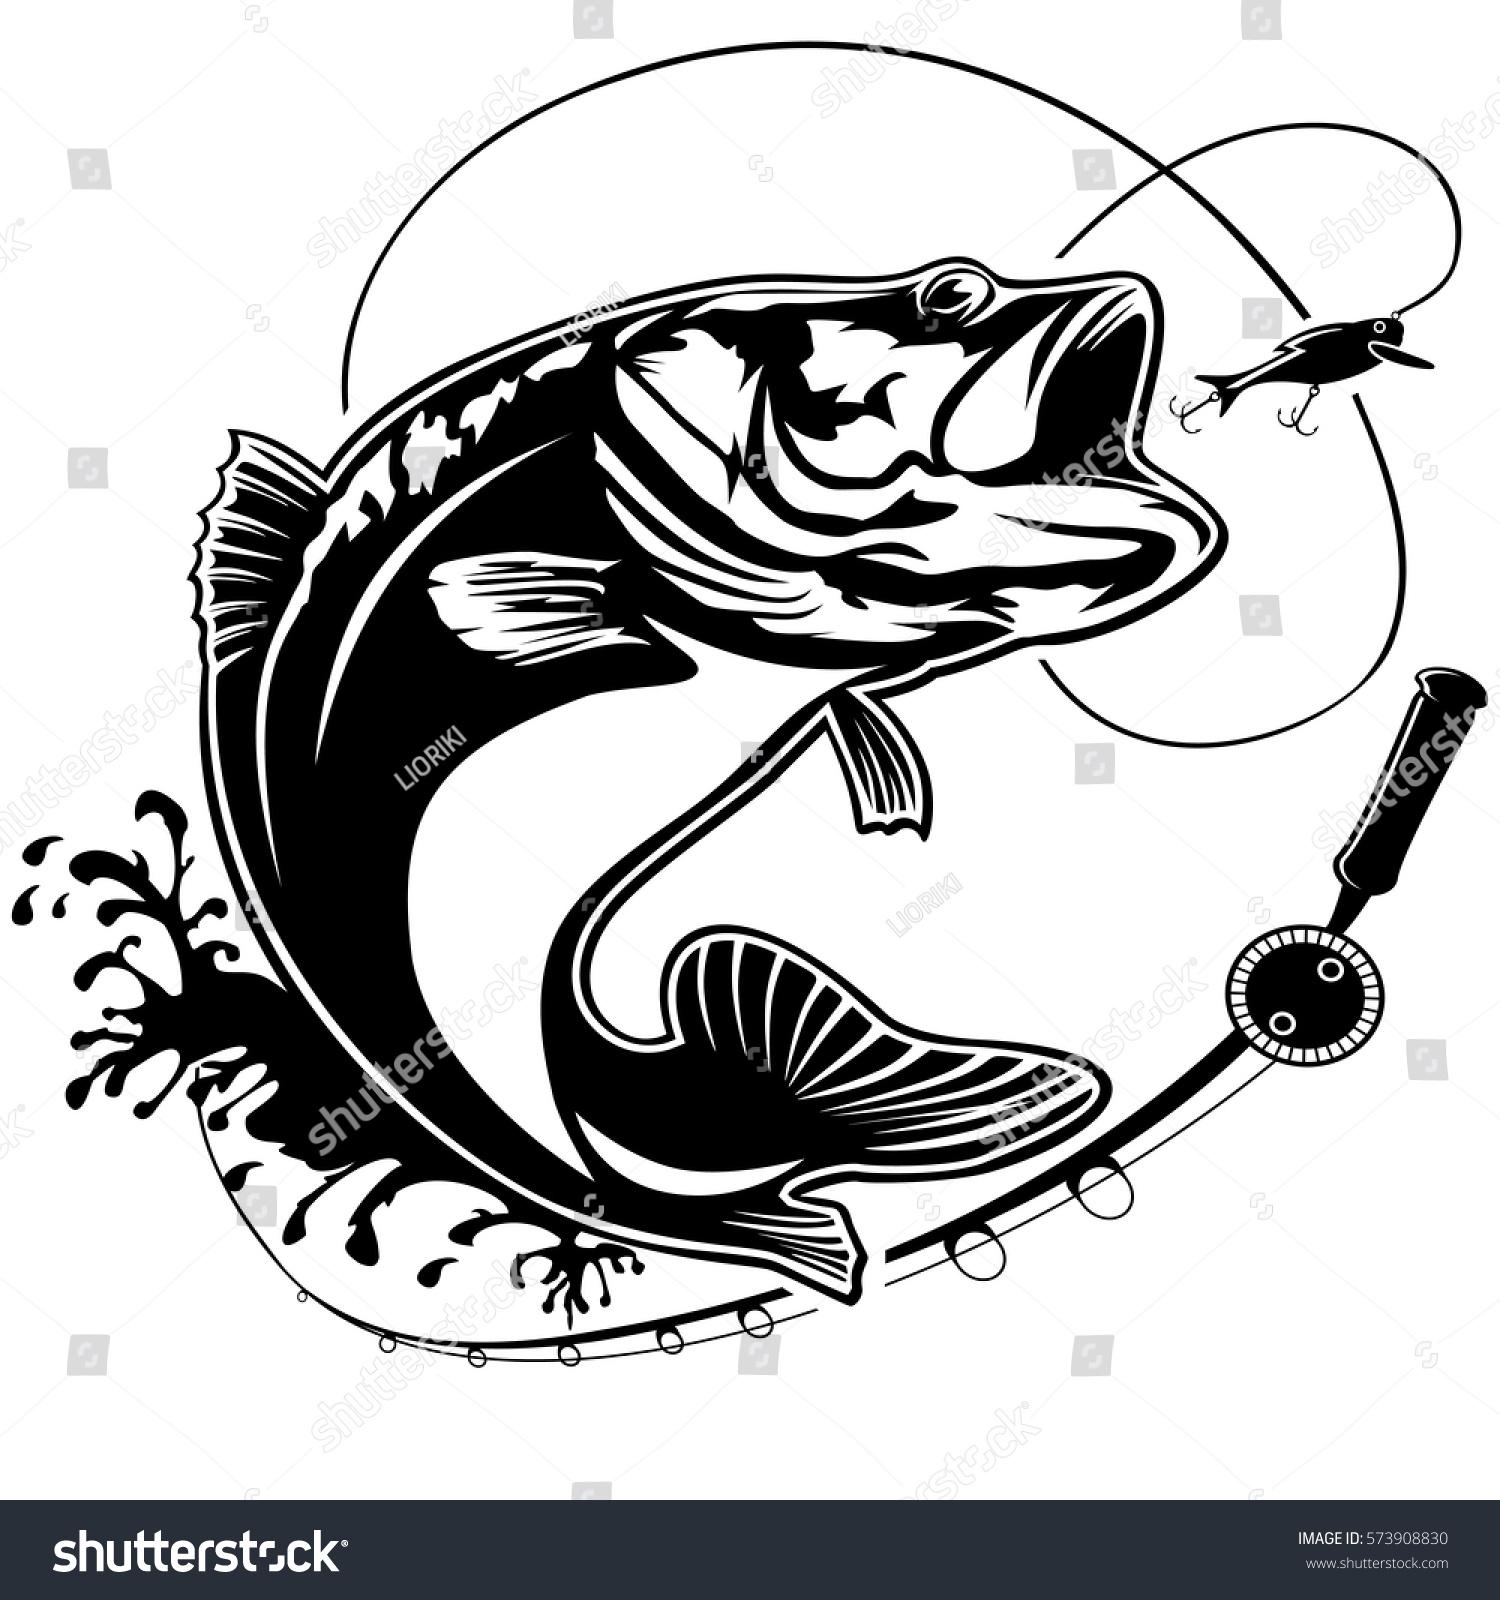 Royalty-free Fishing logo. Bass fish club emblem ...